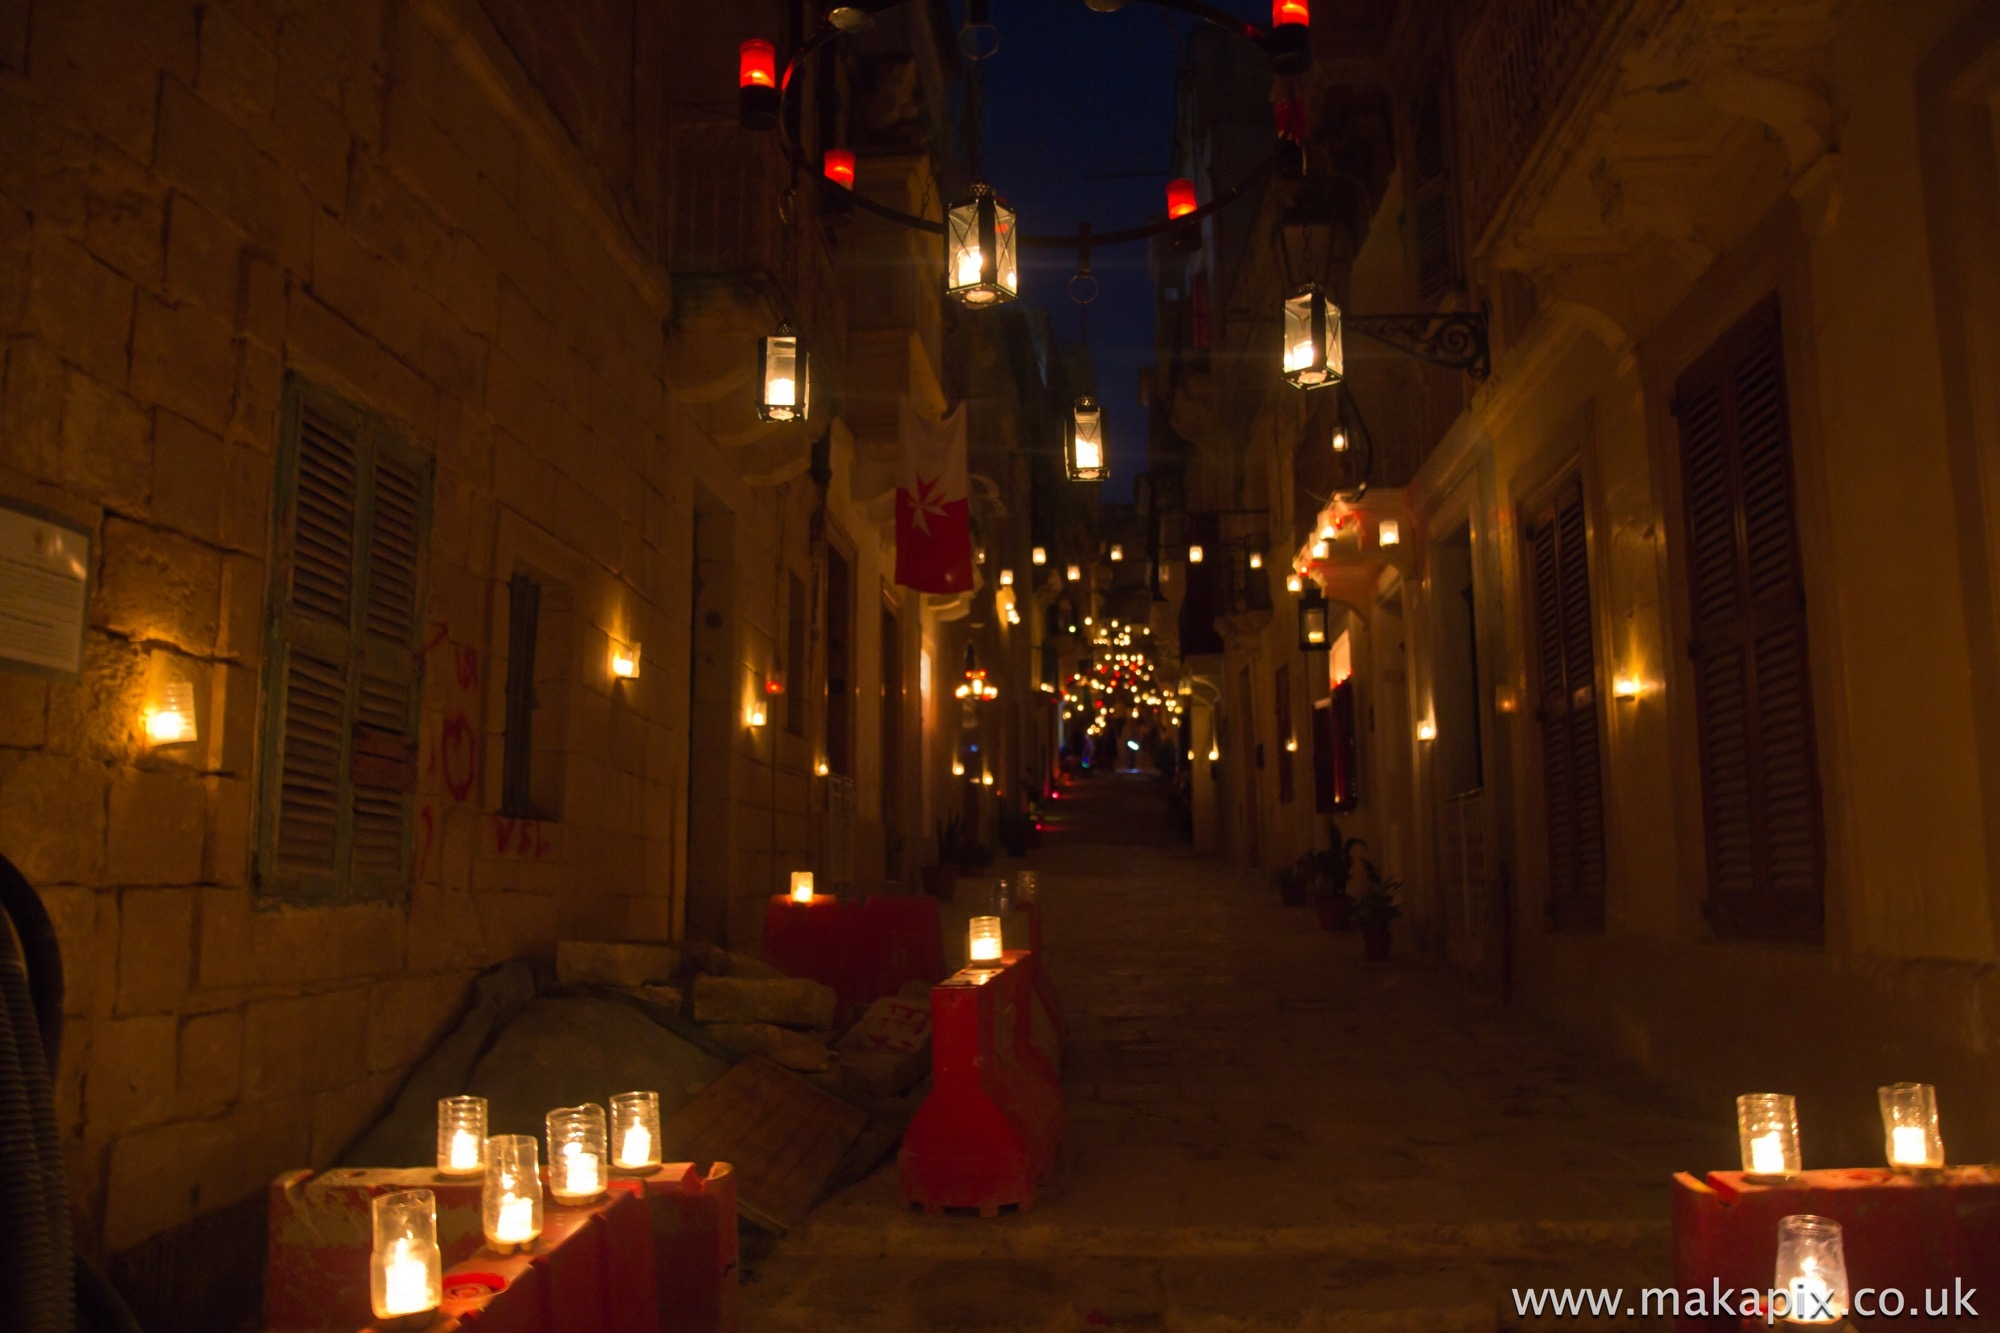 Malta-Birgufest 2014